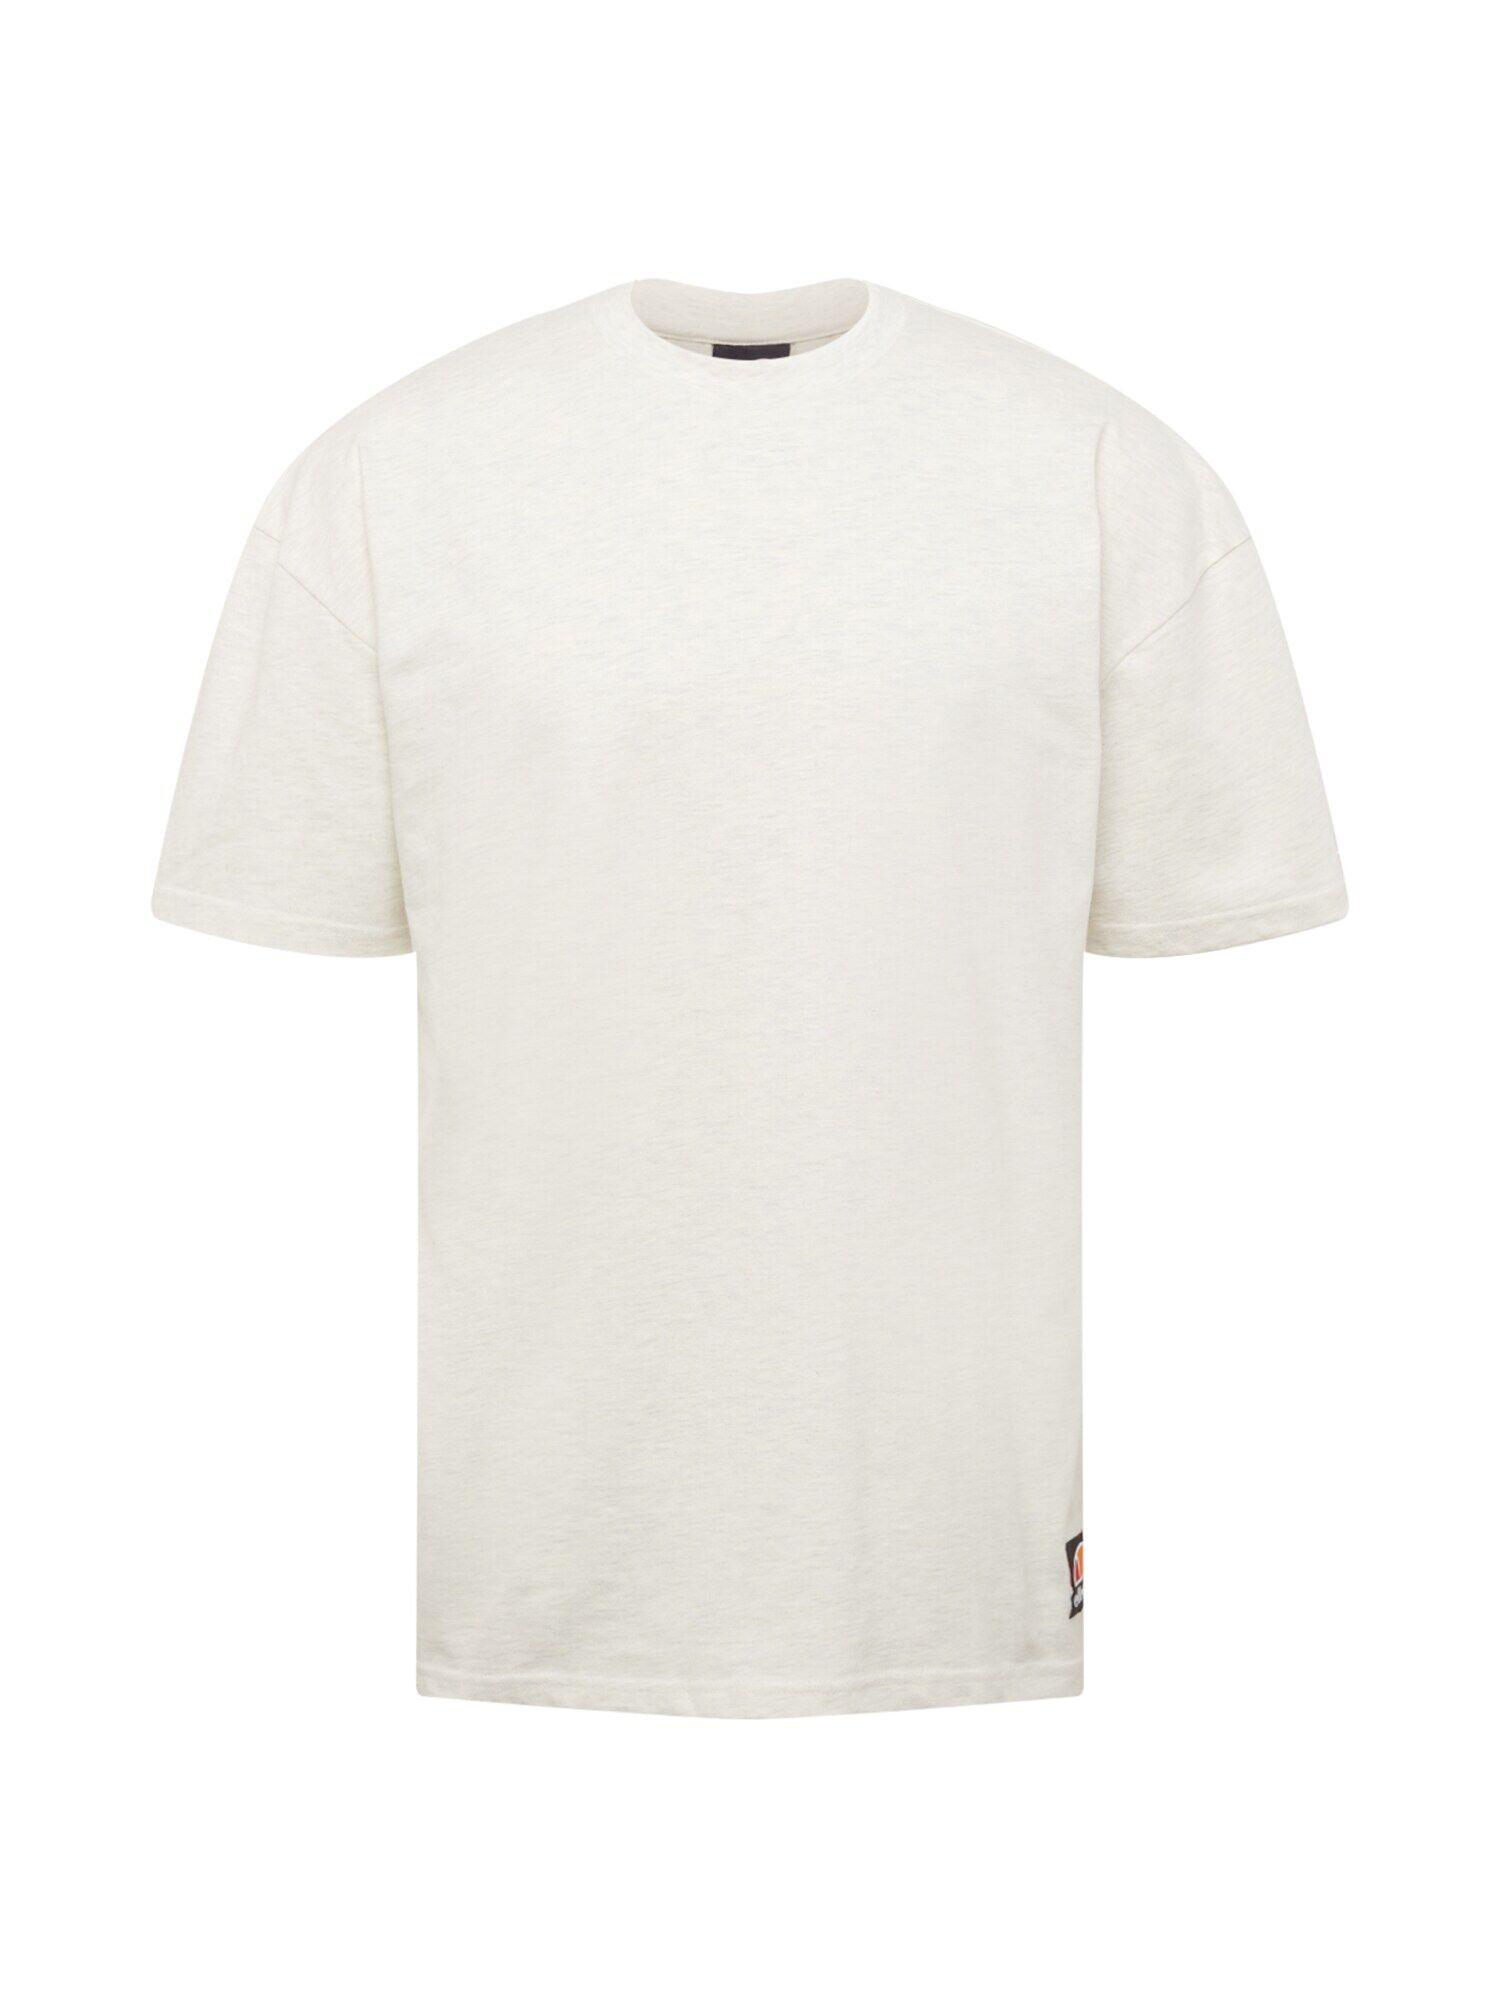 ELLESSE T-Shirt 'Avis'  - Blanc - Taille: XS - male